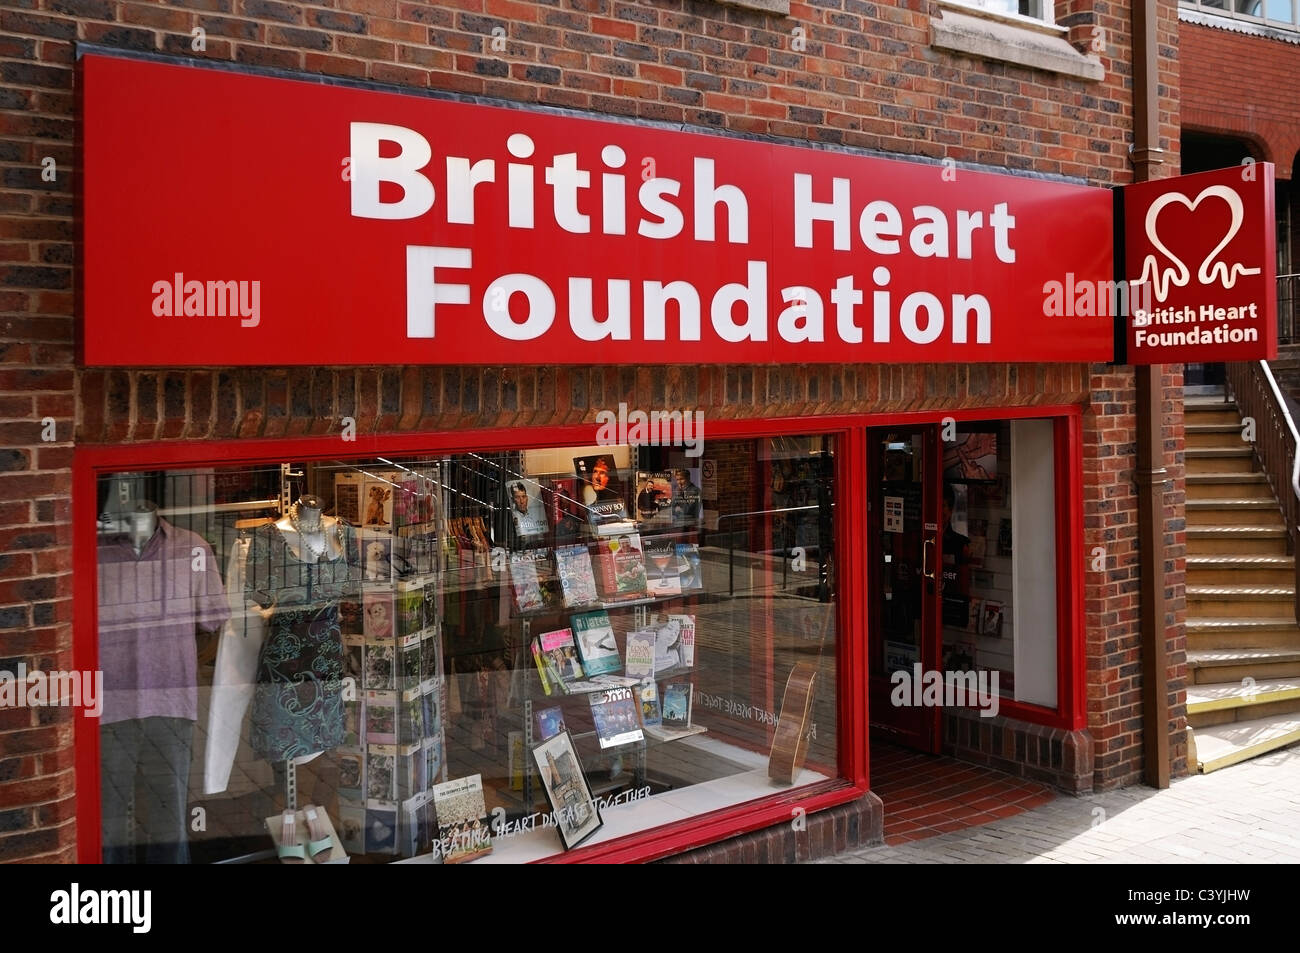 British Heart Foundation Charity Shop, Windsor, Berkshire, United Kingdom. - Stock Image